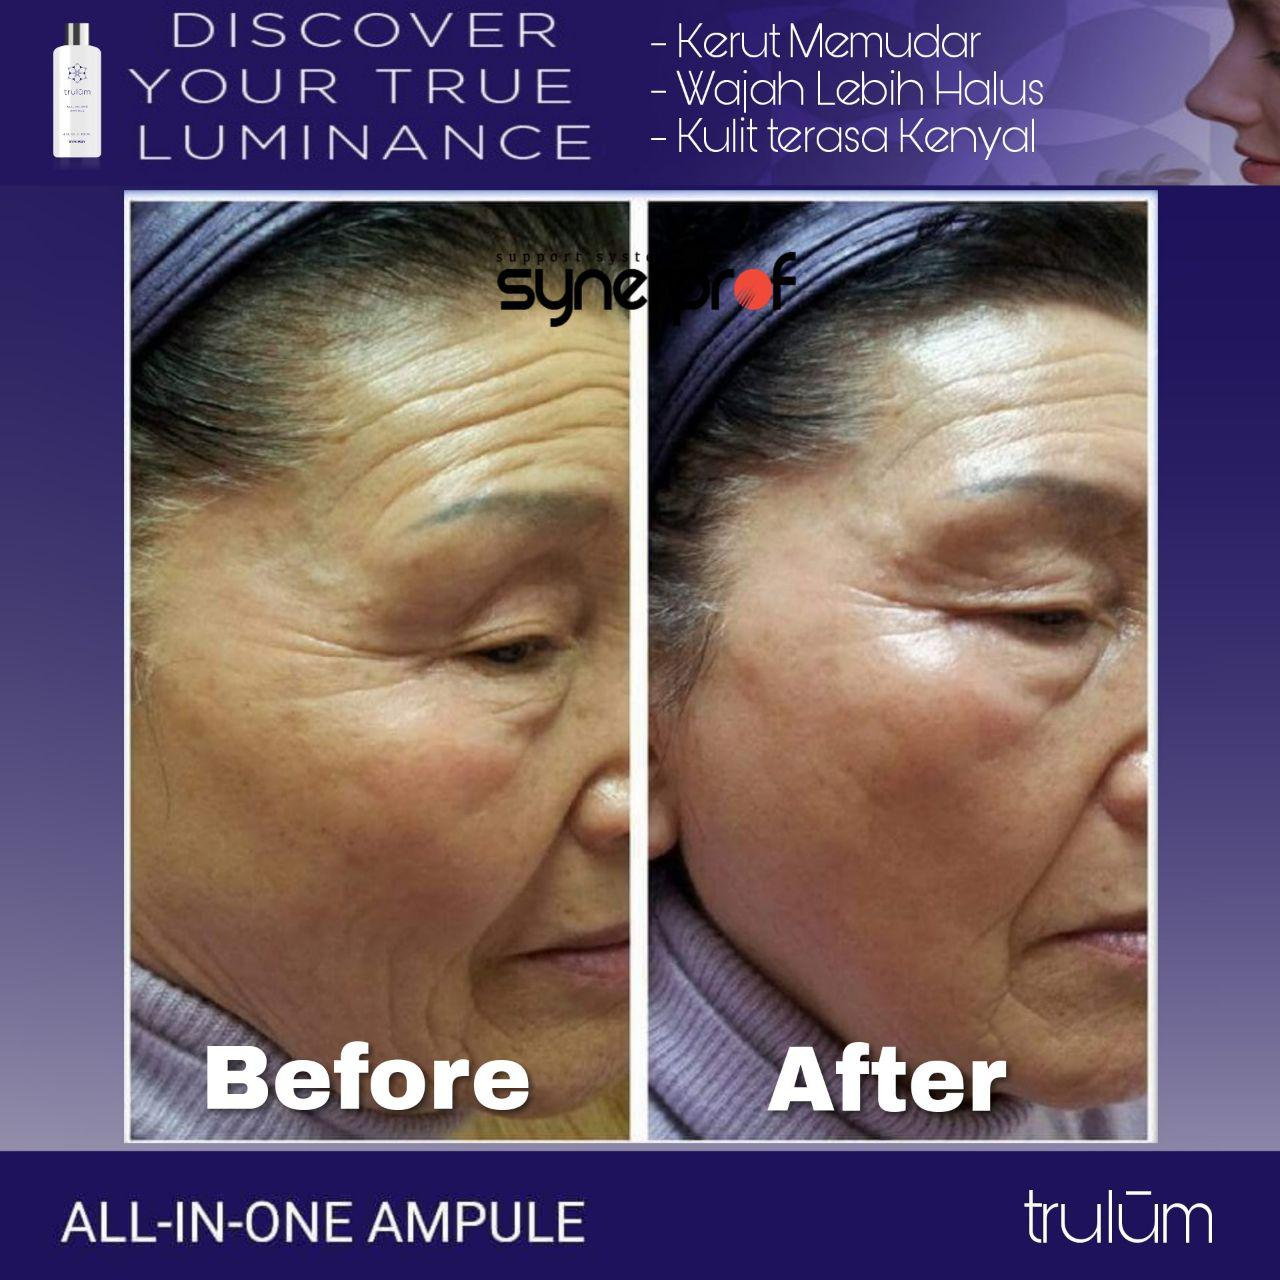 Klinik Kecantikan Trulum Korea Di Bua Kana, Kota Makassar WA: 08112338376